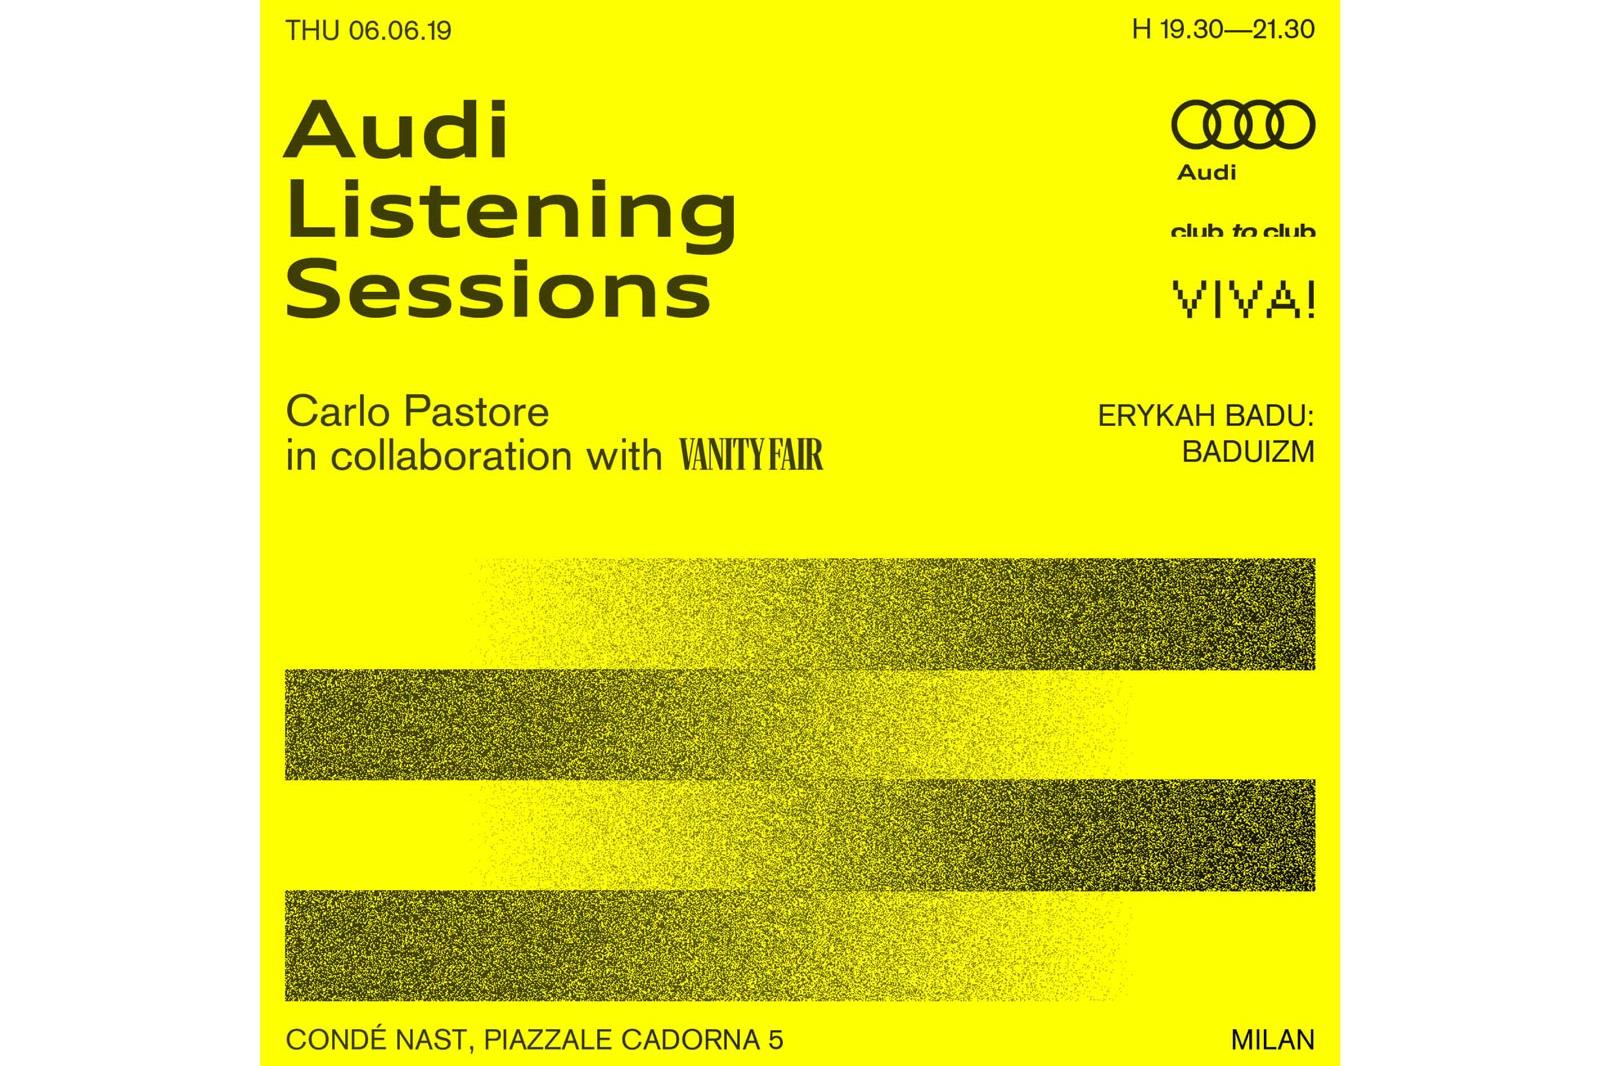 Audi Listening Sessions def 3